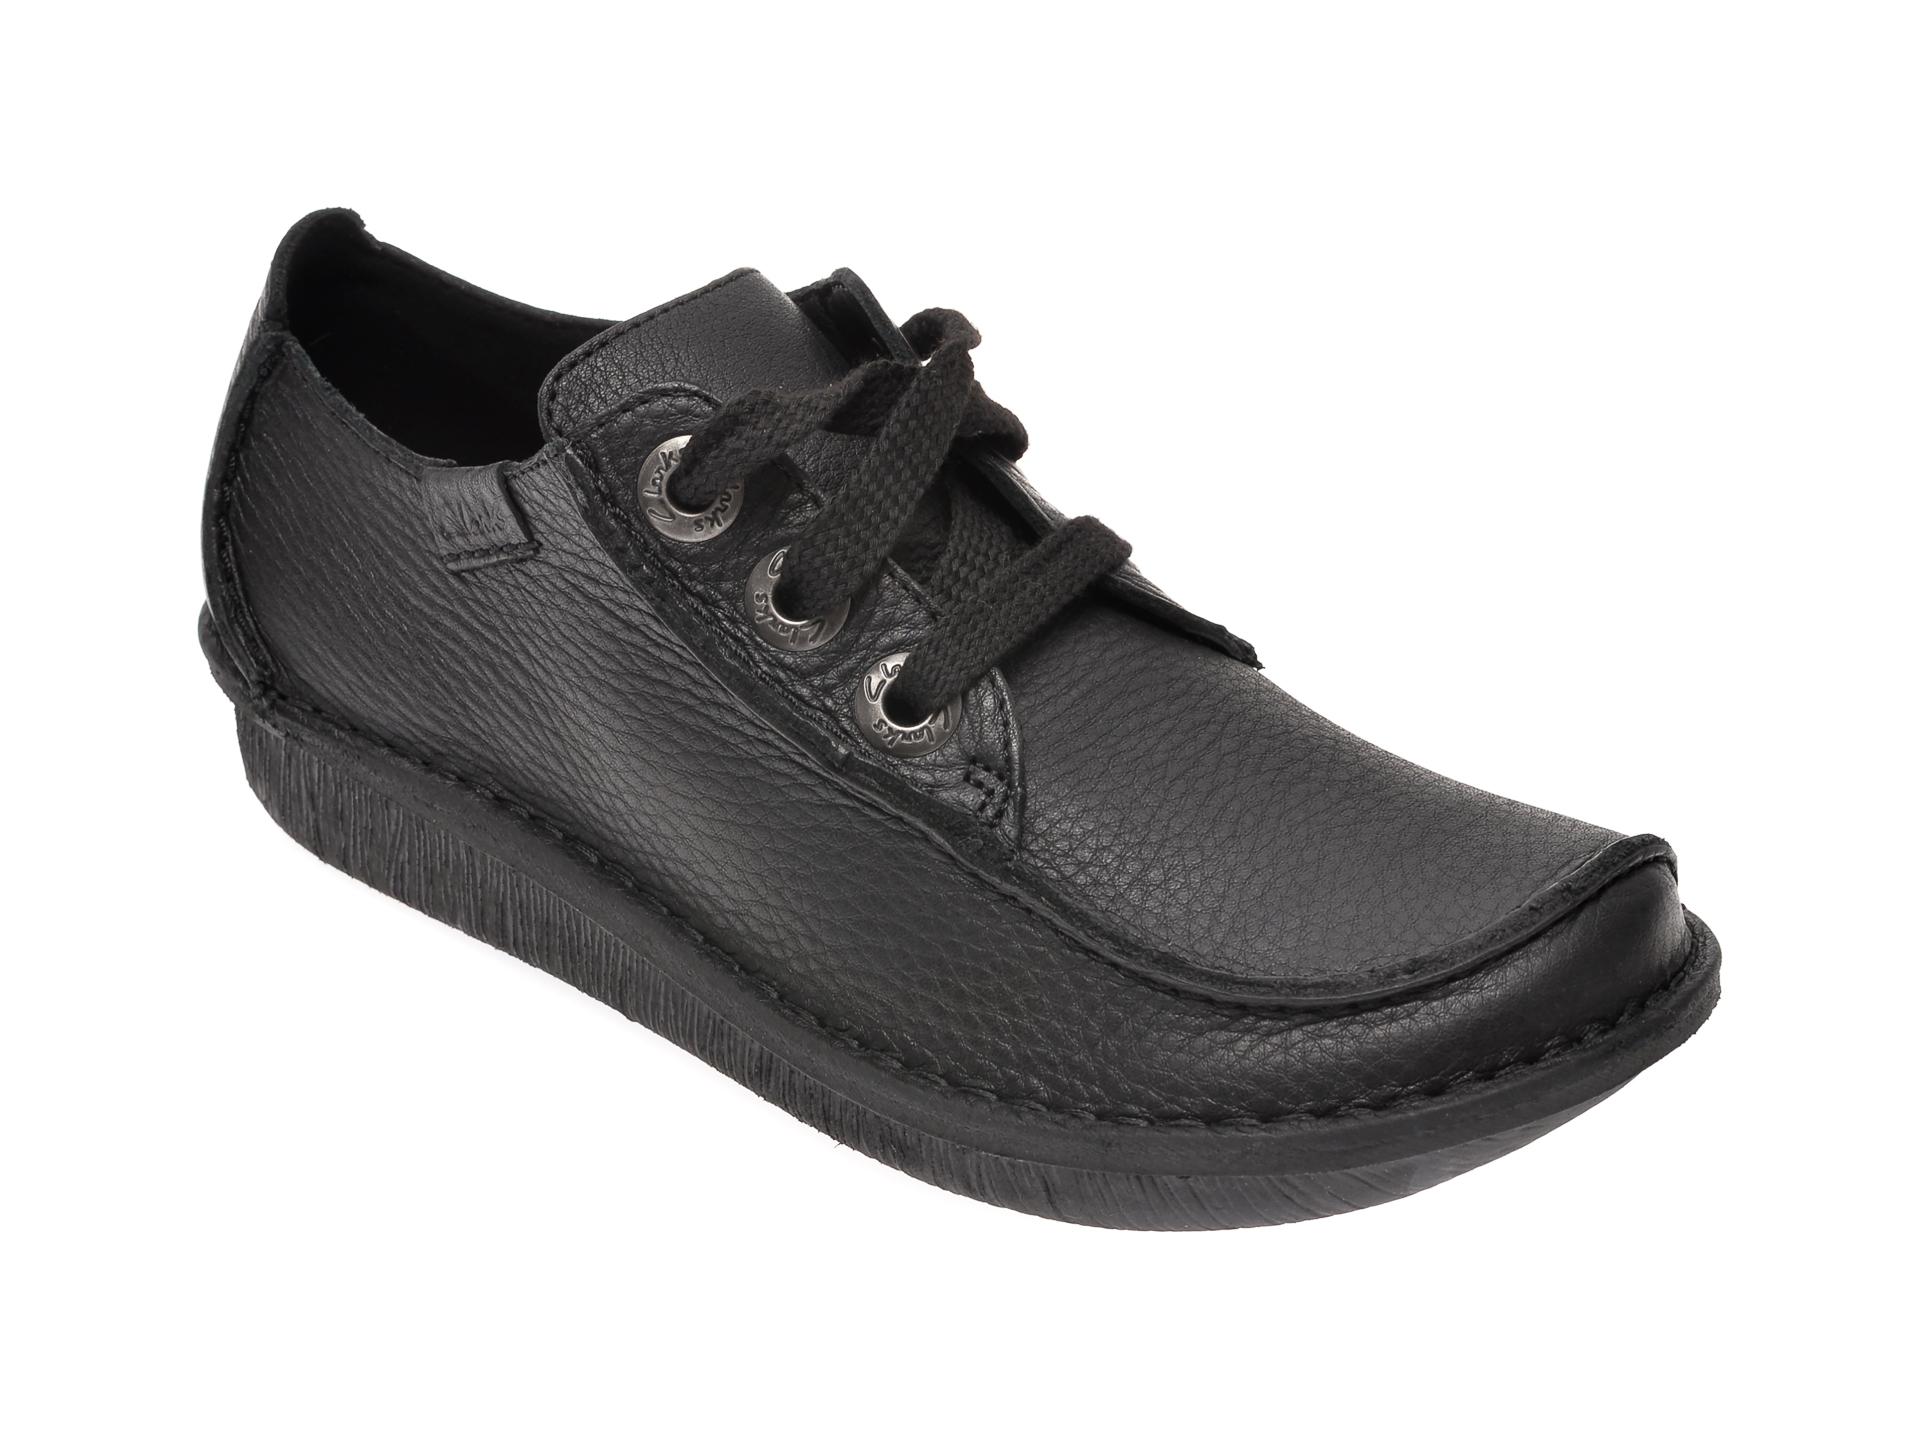 Pantofi CLARKS negri, Funny Dream, din piele naturala imagine otter.ro 2021